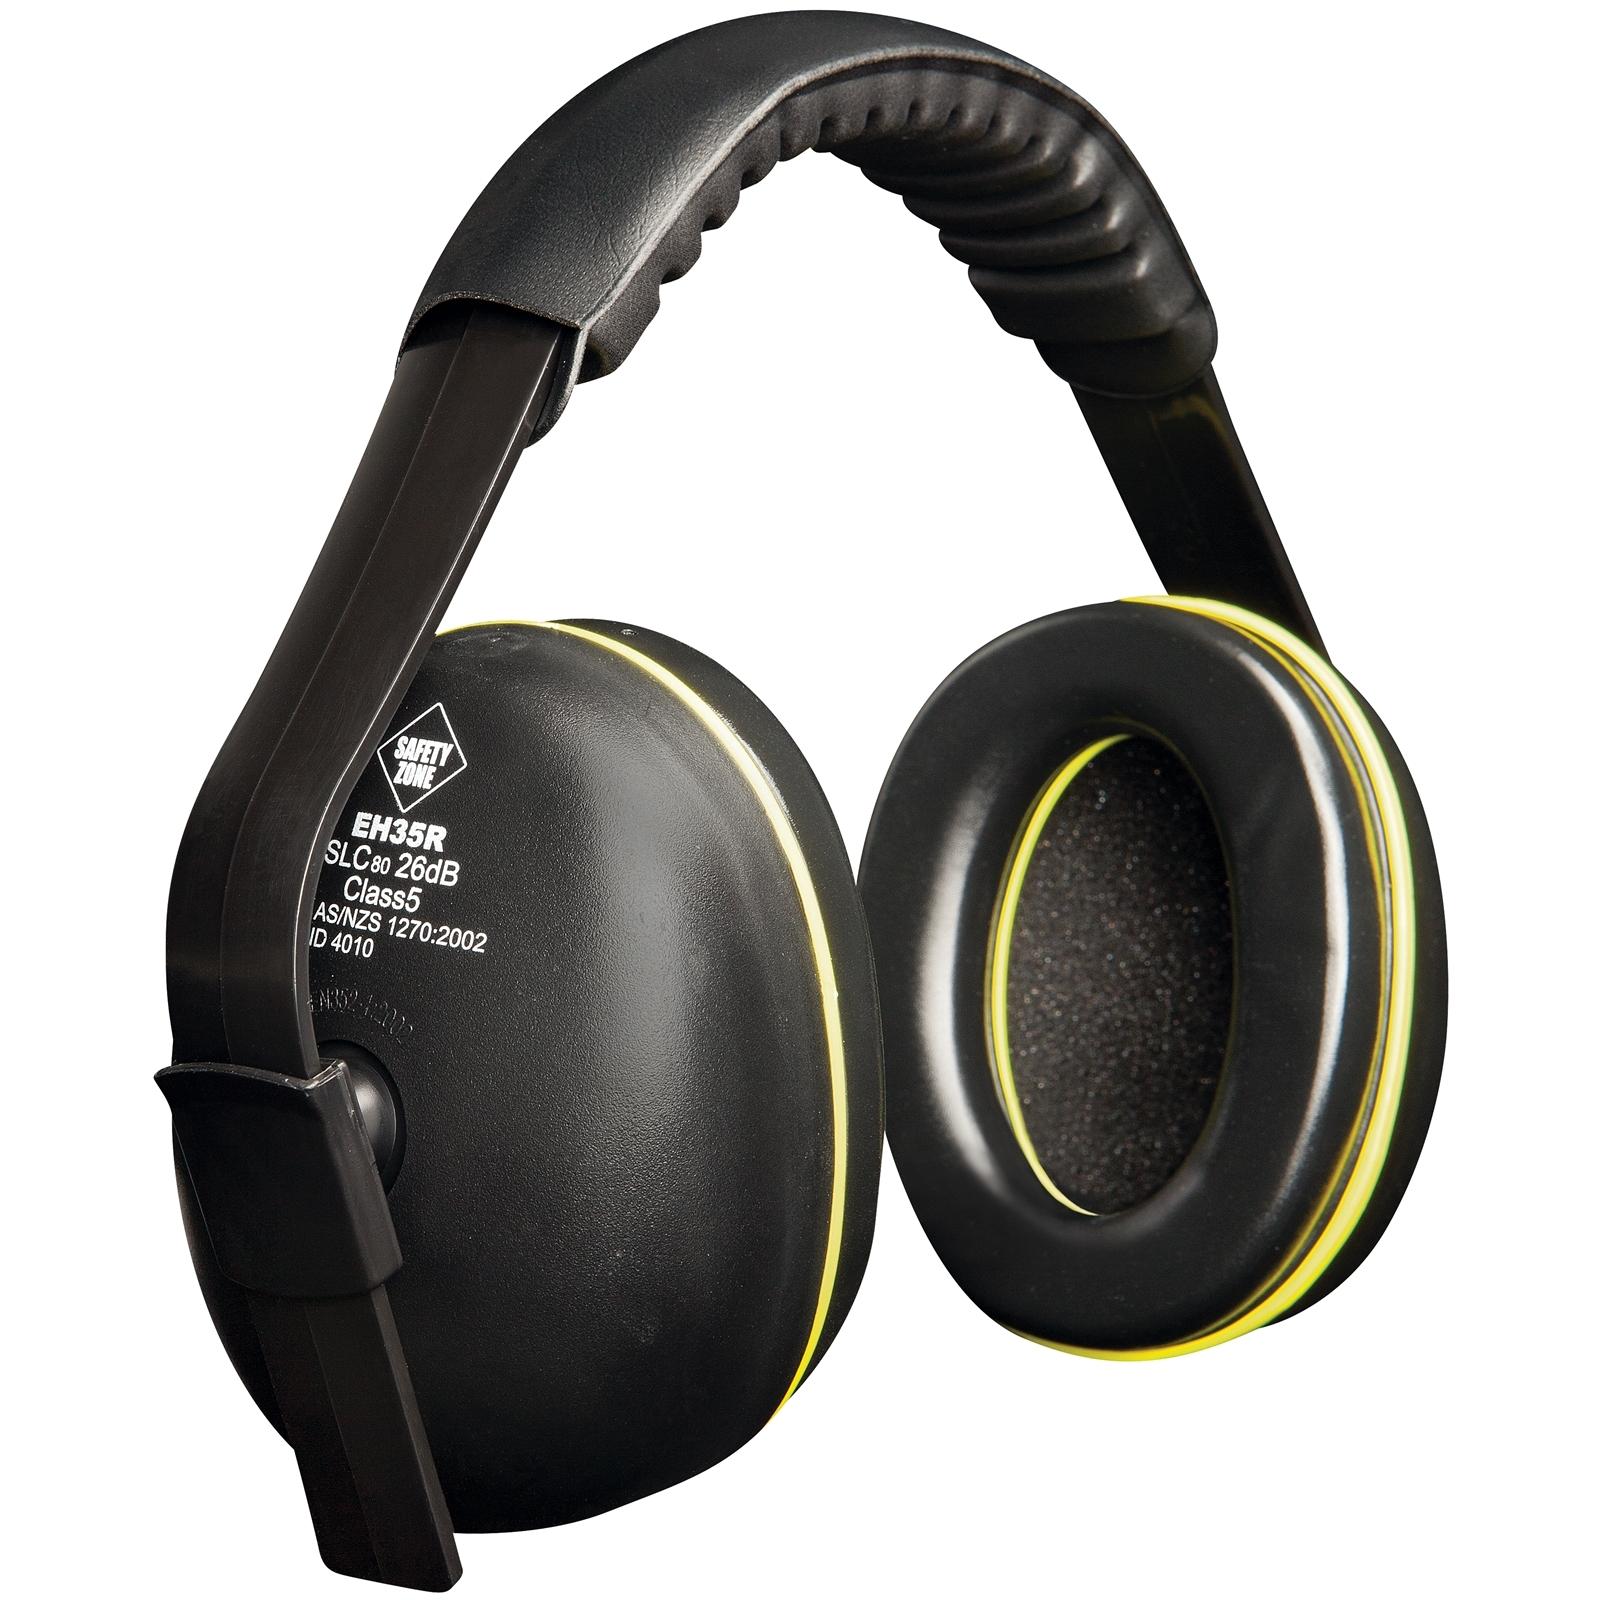 Protector General Purpose Ear Muffs